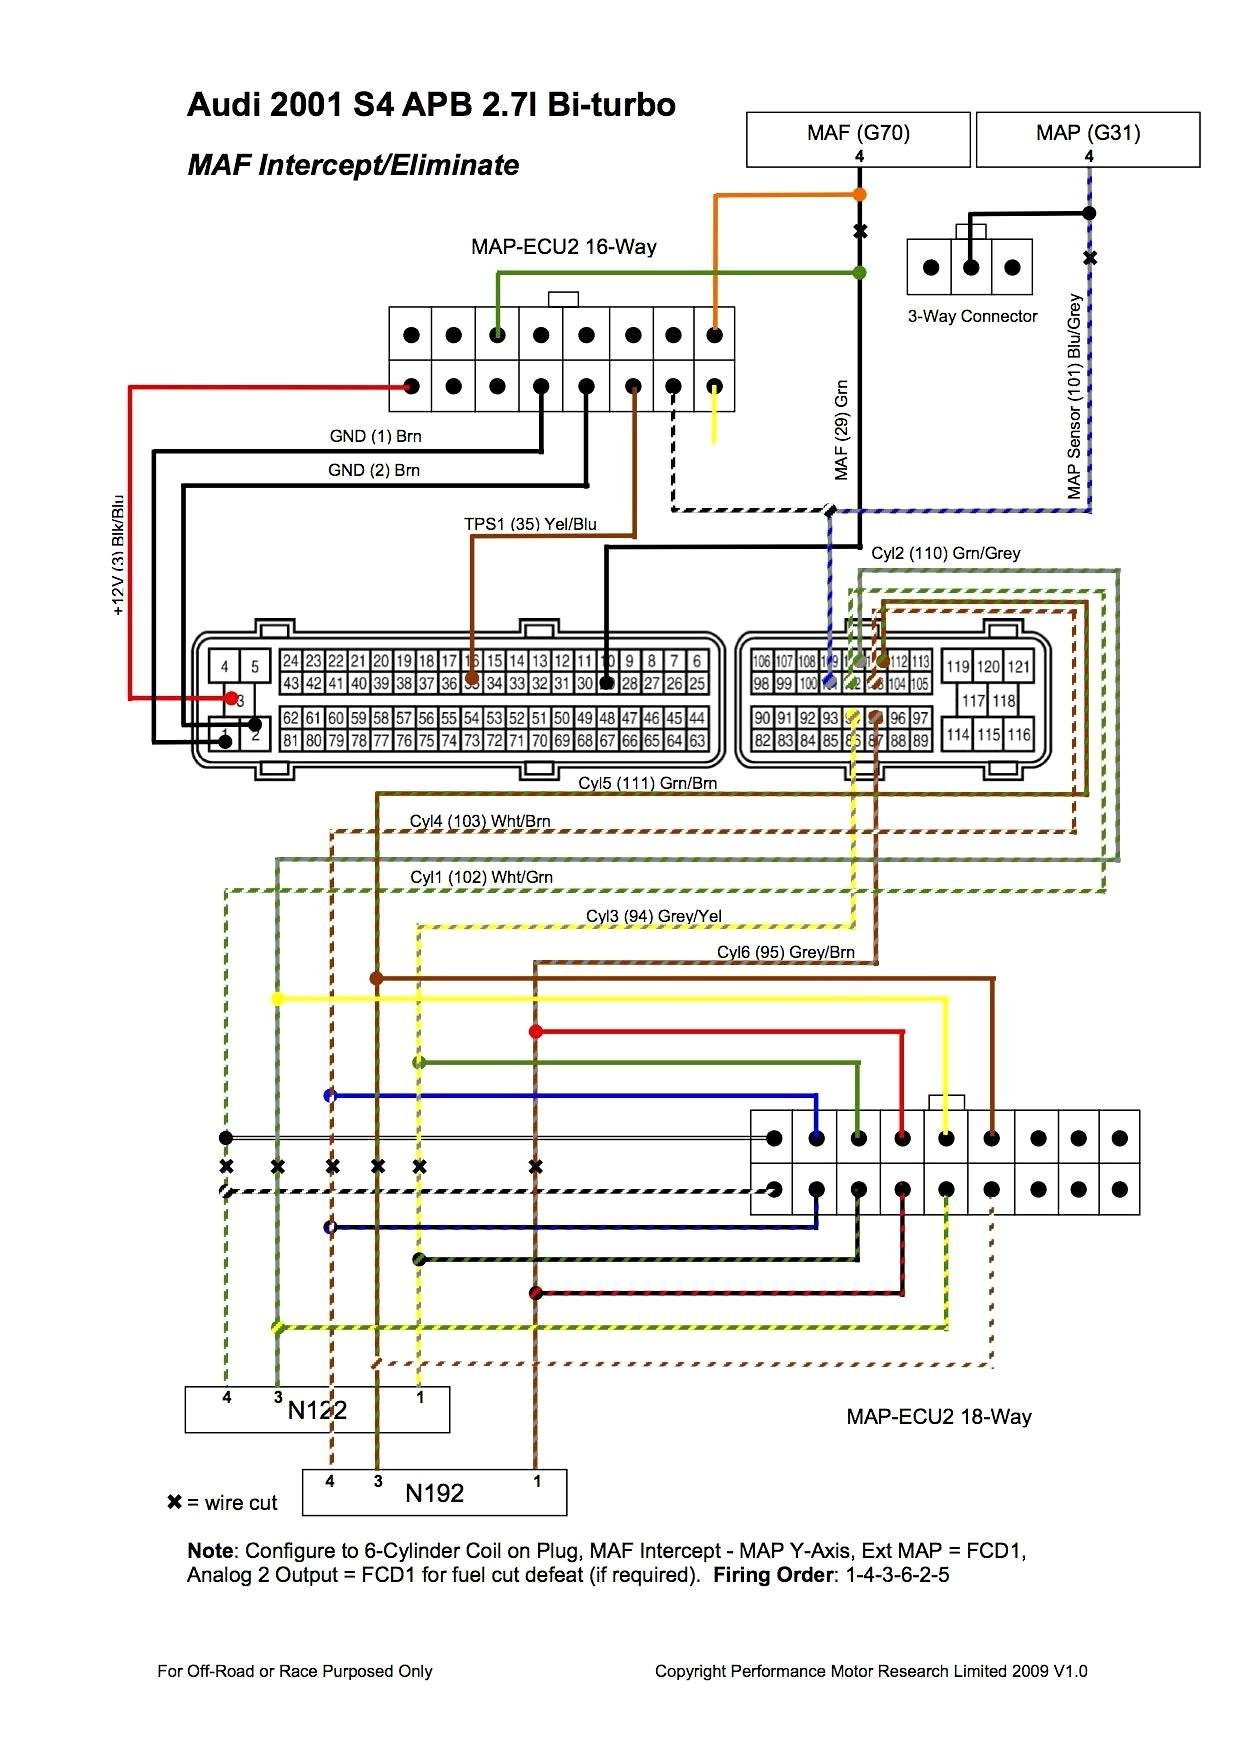 2000 Dodge Caravan Wiring Diagram 2008 Dodge Grand Caravan Wiring Diagram Worksheet and Wiring Diagram • Of 2000 Dodge Caravan Wiring Diagram